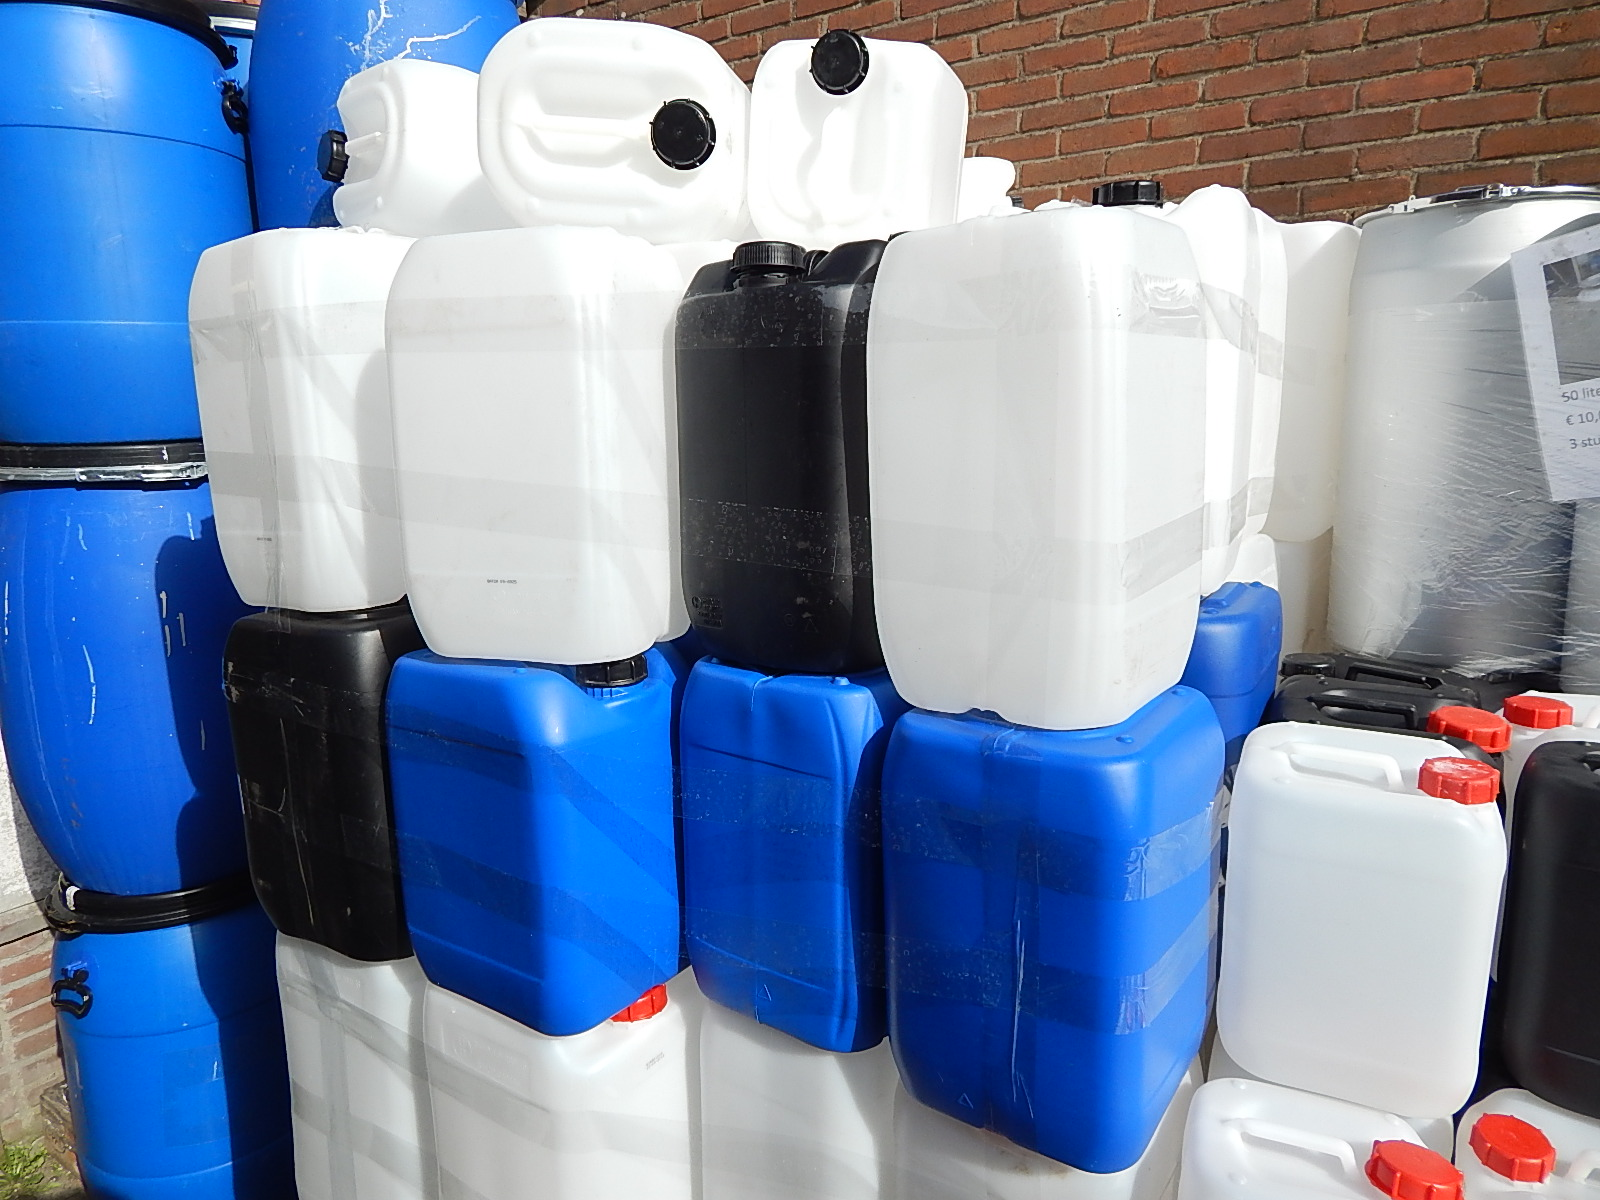 Jerrycan 25 liter